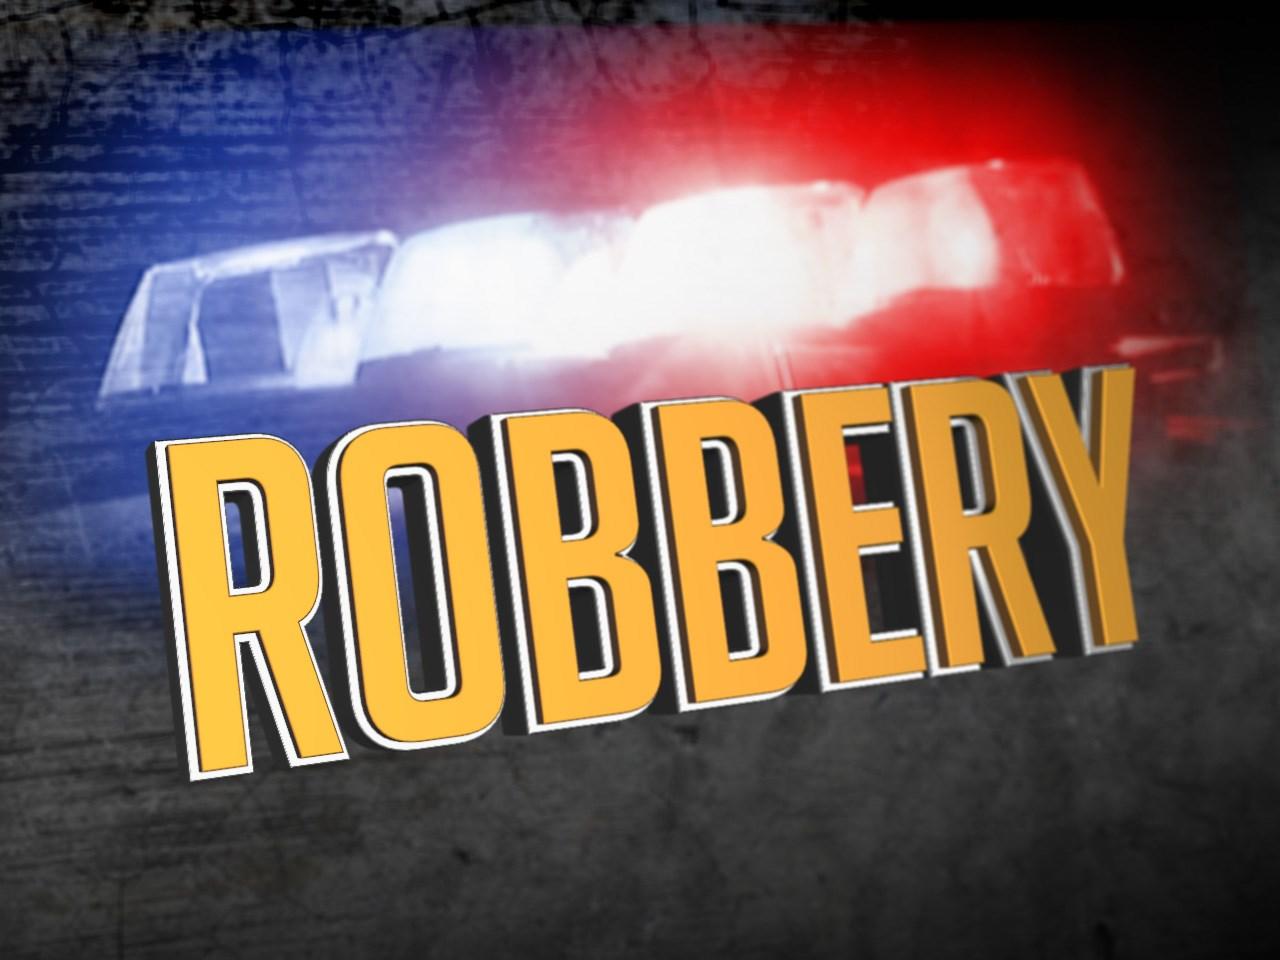 robbery_1507607495033.jpg